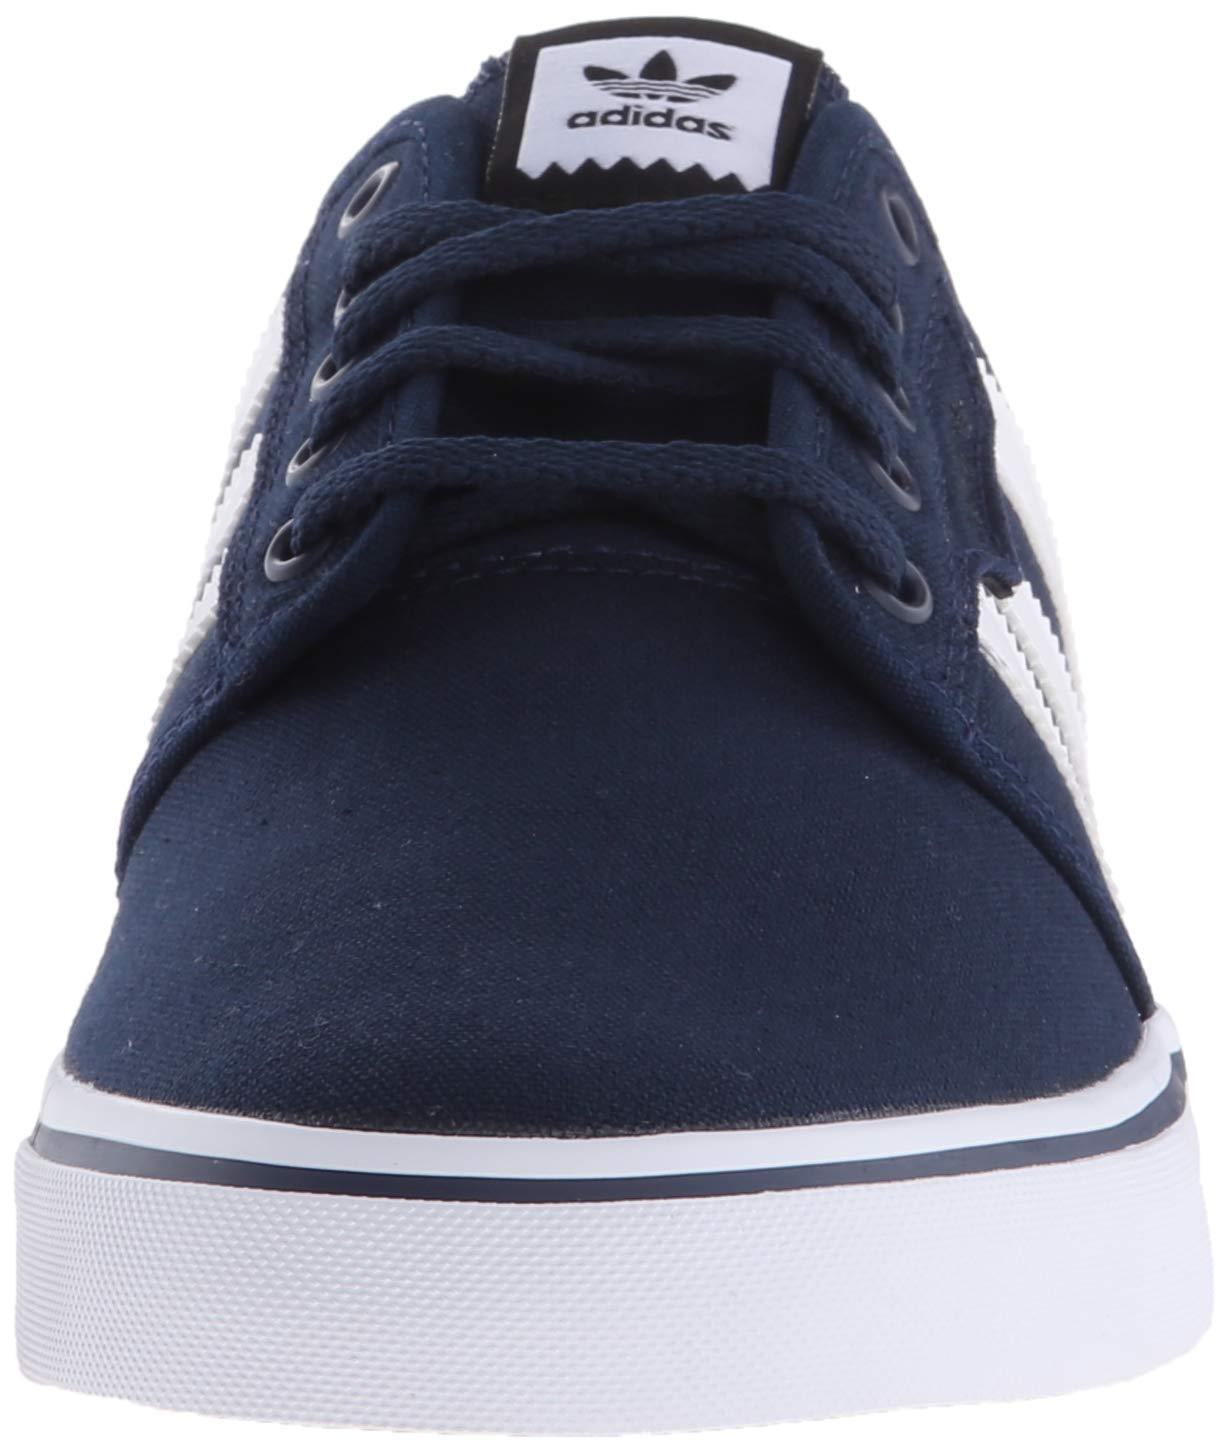 sneakers for cheap 2c004 3d770 adidas Men s Seeley Skate Shoe – A2Z Shop